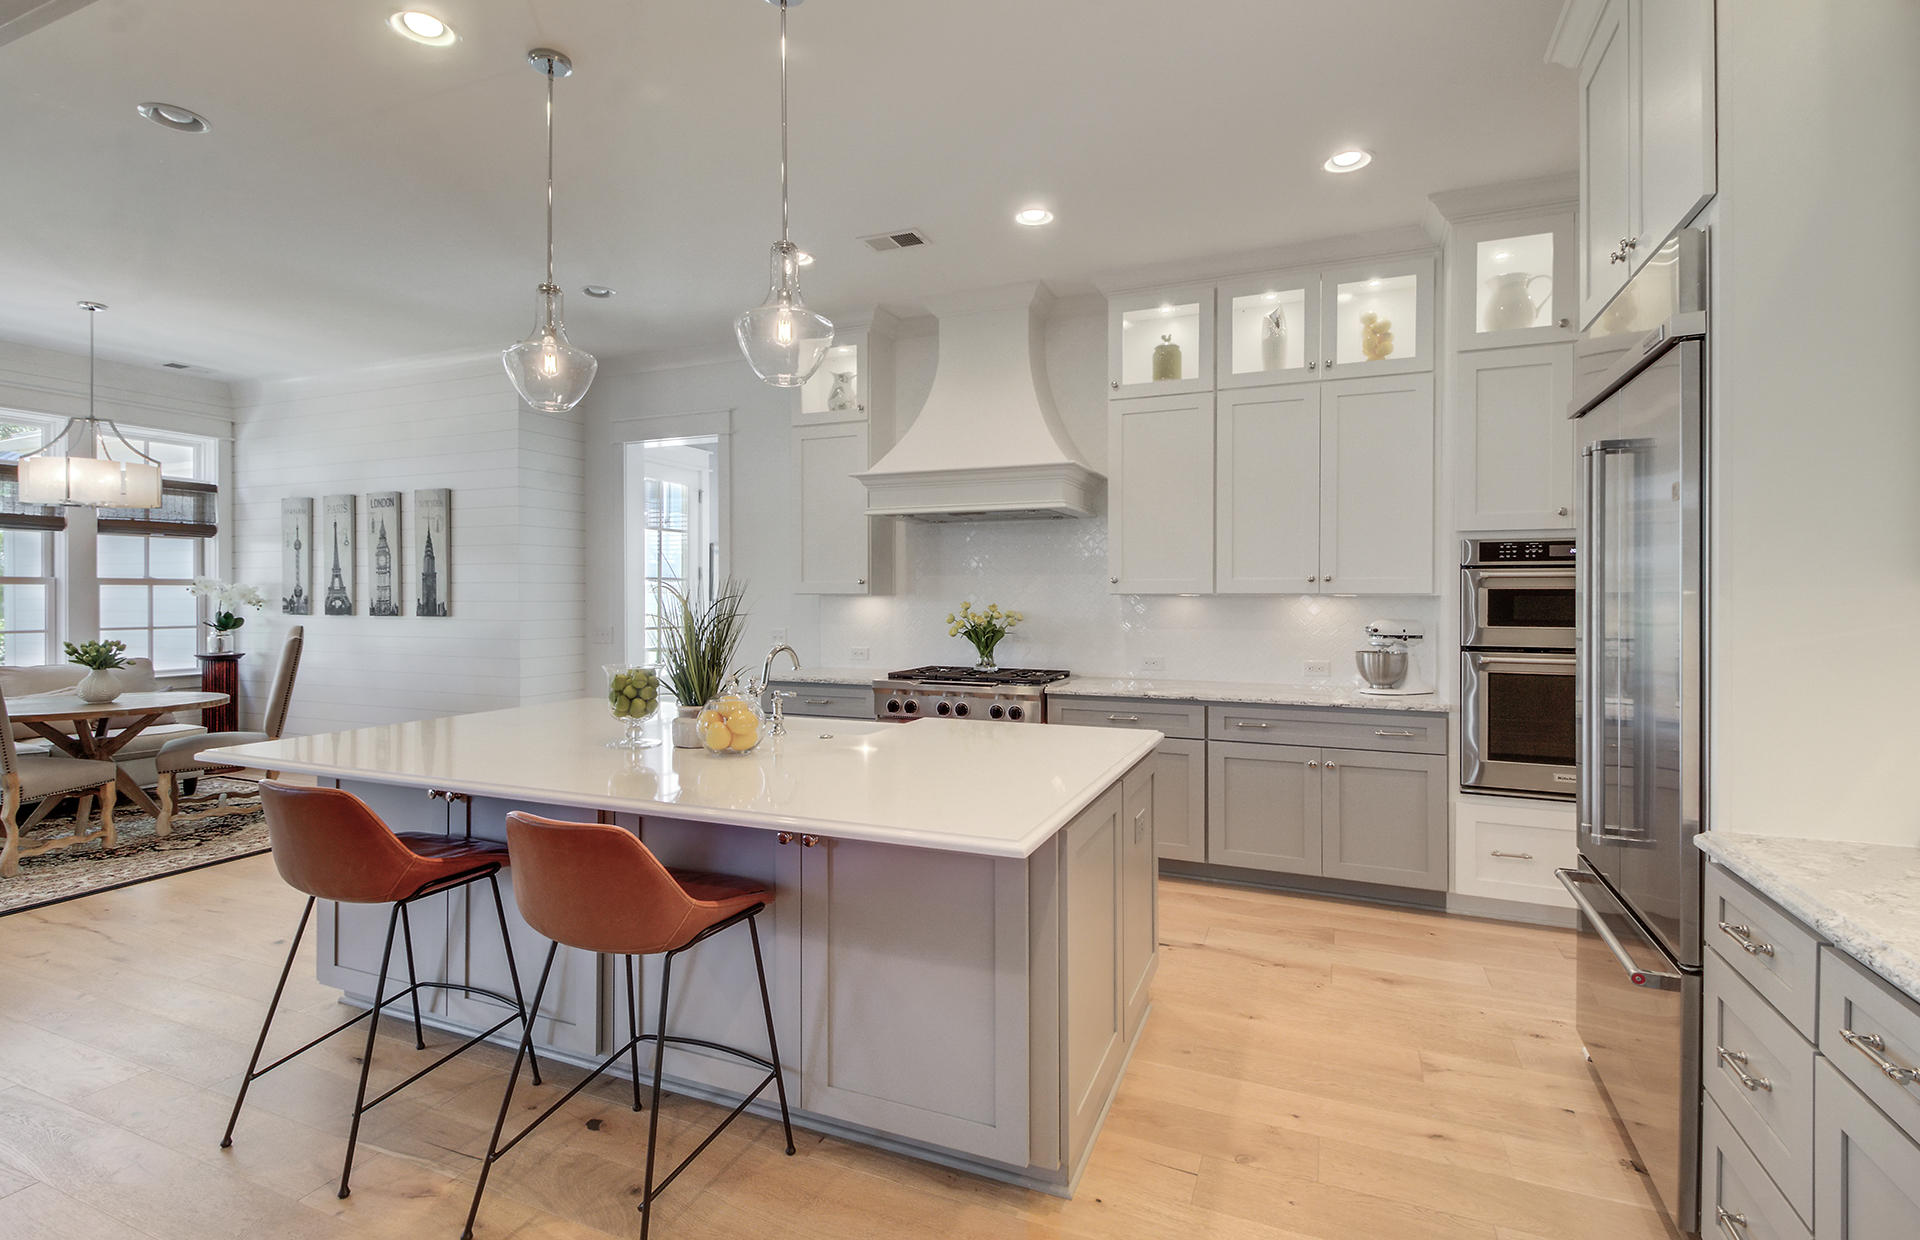 Daniel Island Homes For Sale - 135 Brailsford, Charleston, SC - 32